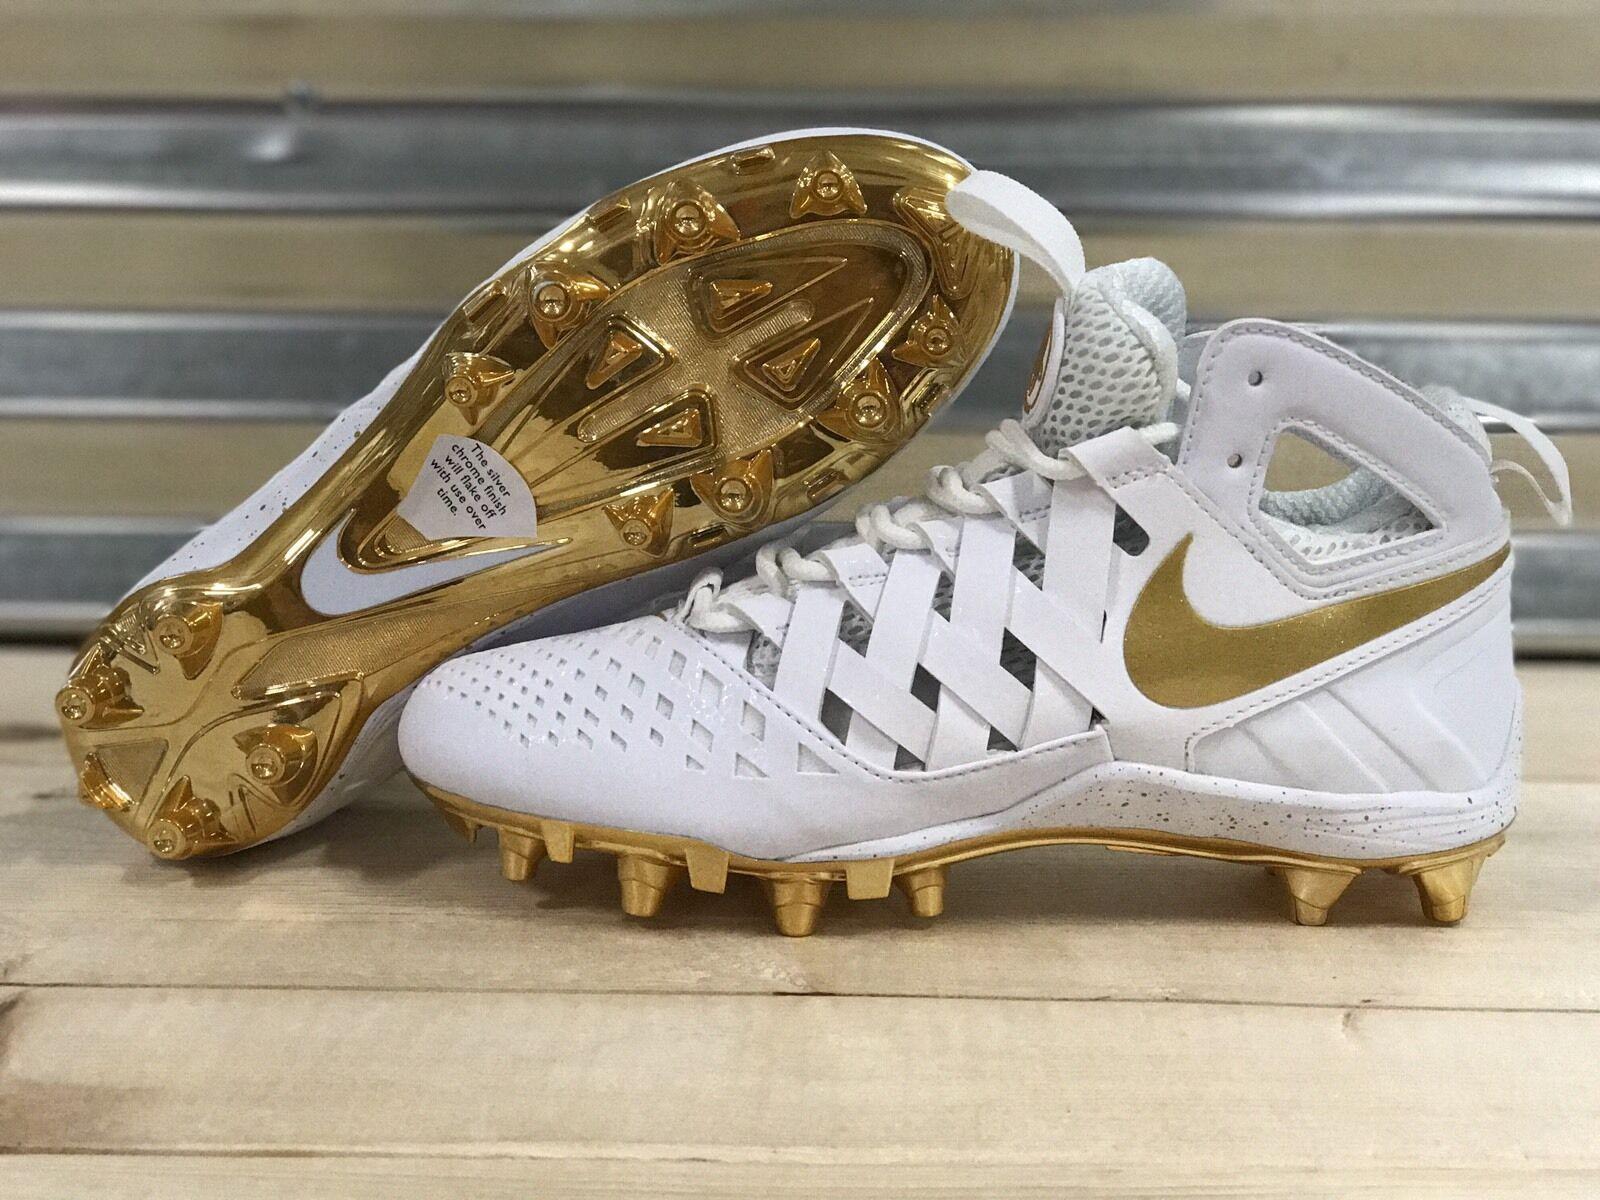 Details about Nike Huarache 5 Lacrosse Cleats White Metallic Gold Chrome SZ  16 ( 807142-170 )